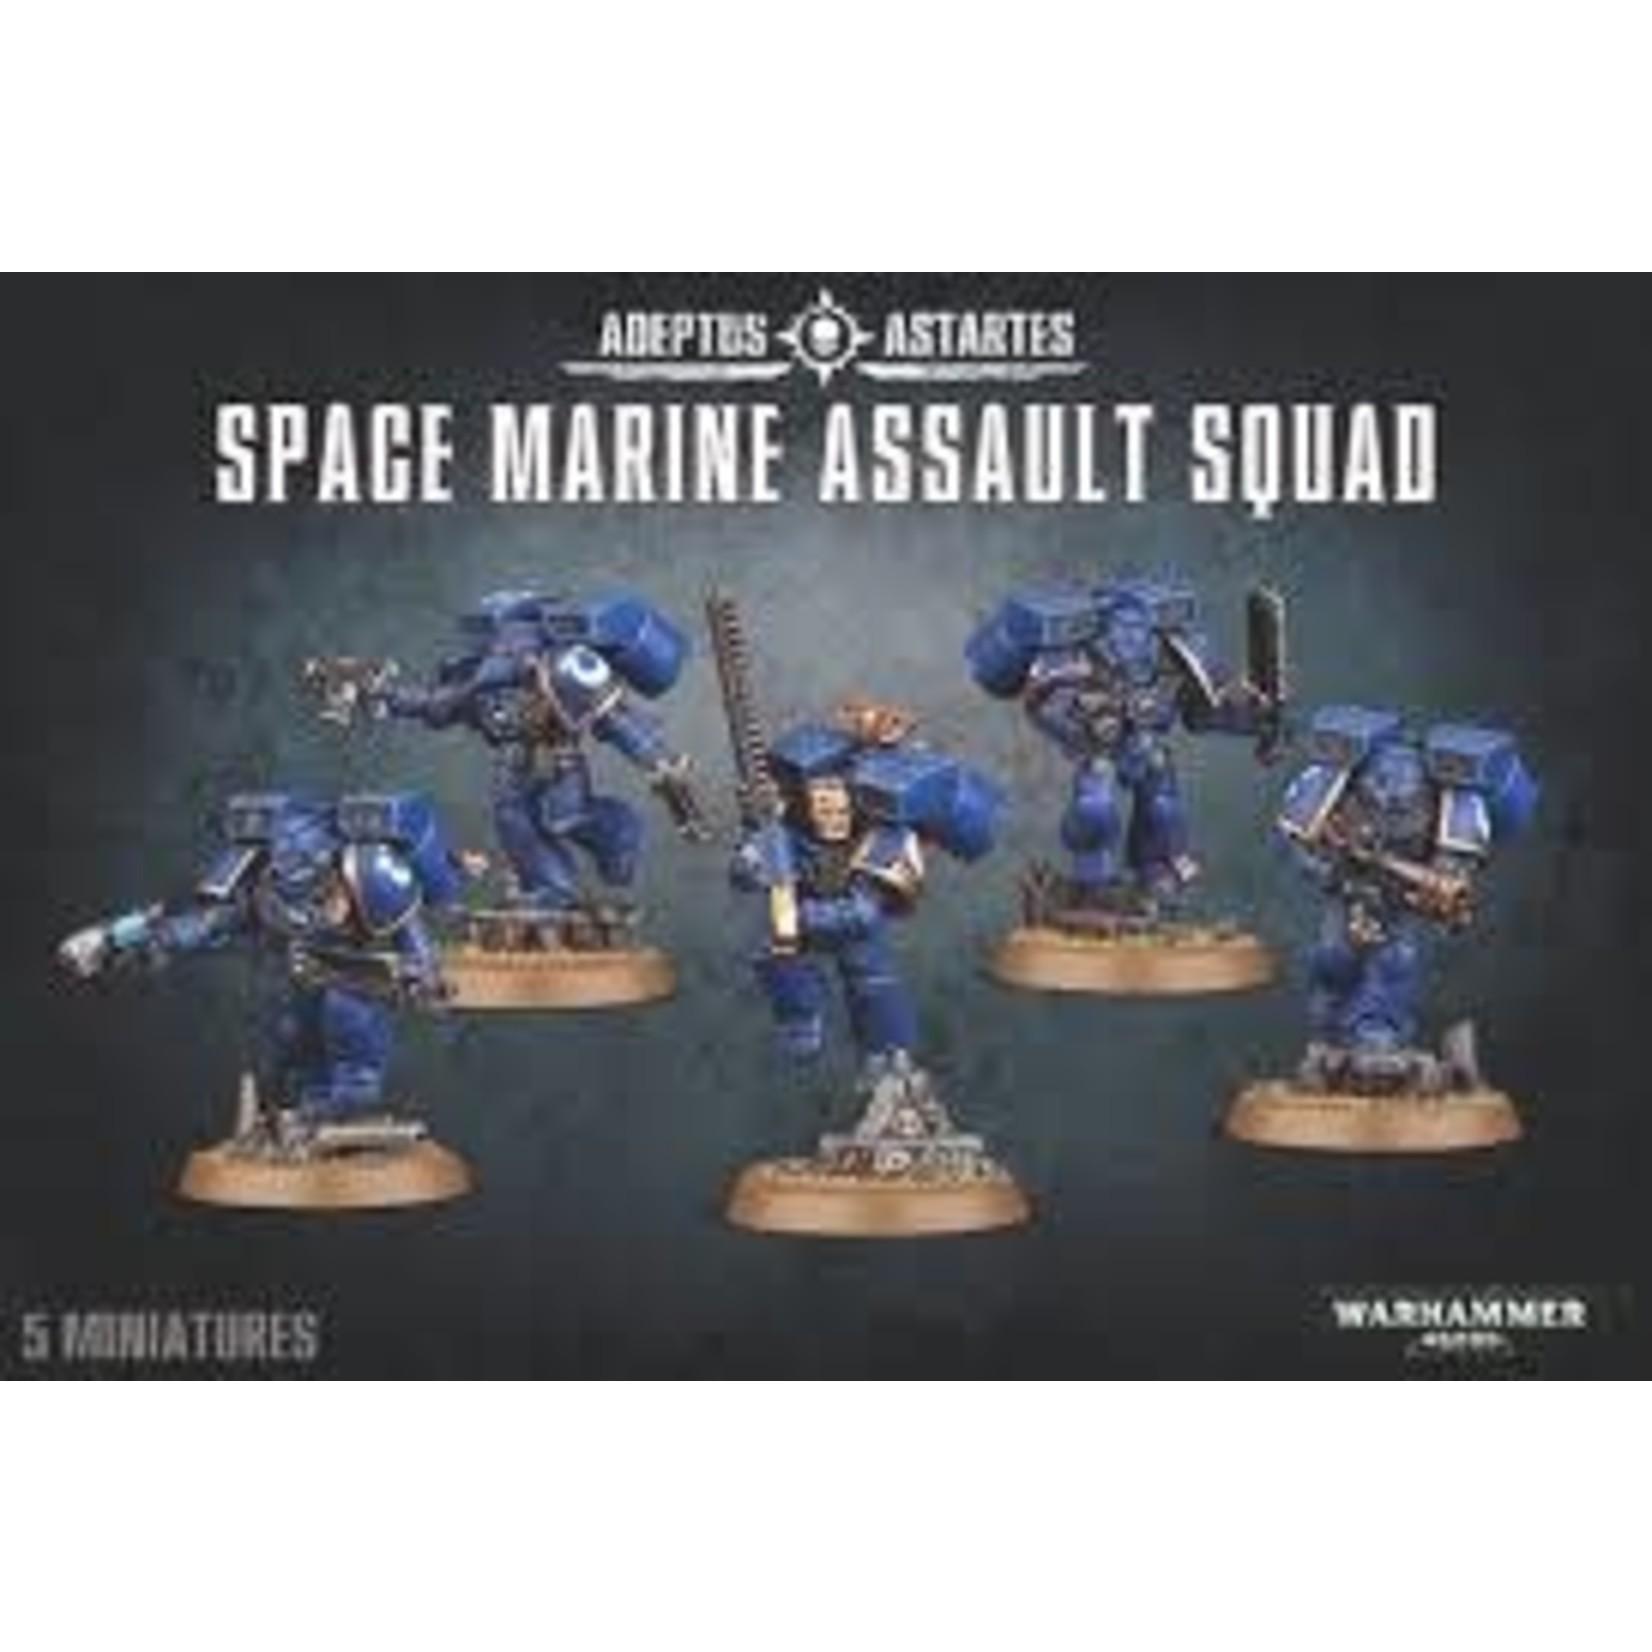 Space Marine Assault Squad (40K)